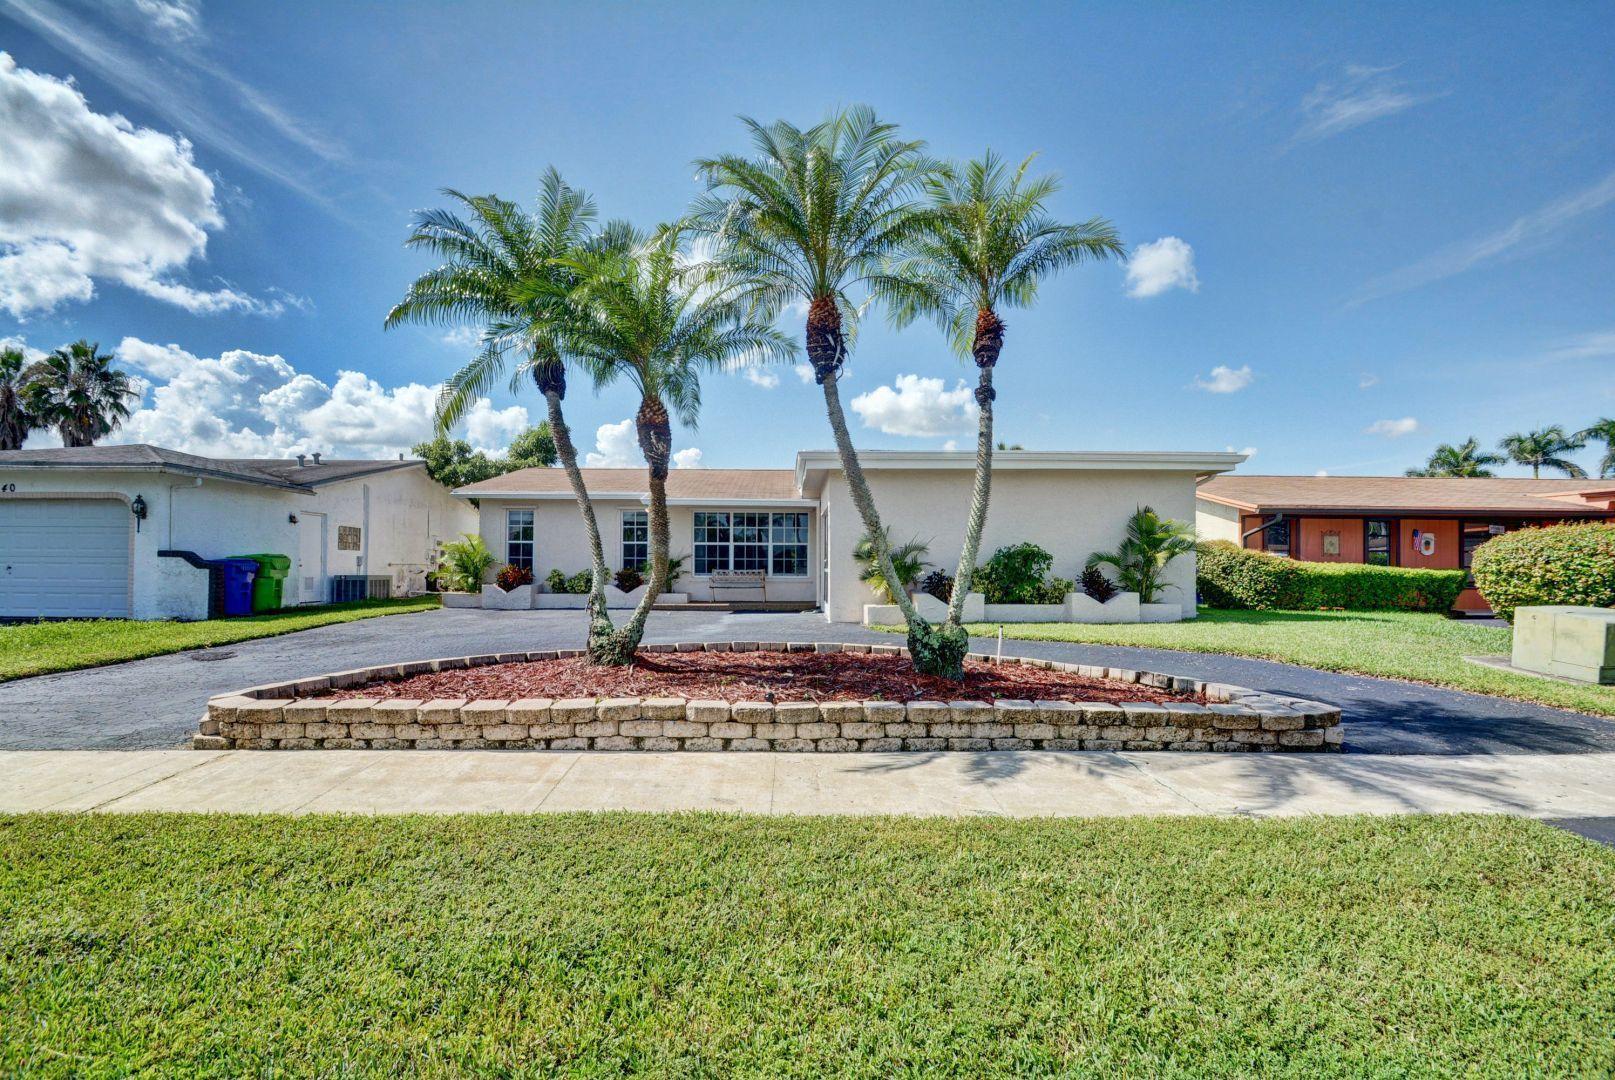 Home for sale in SUNRISE GOLF VLG SEC 24 PART 5 Sunrise Florida